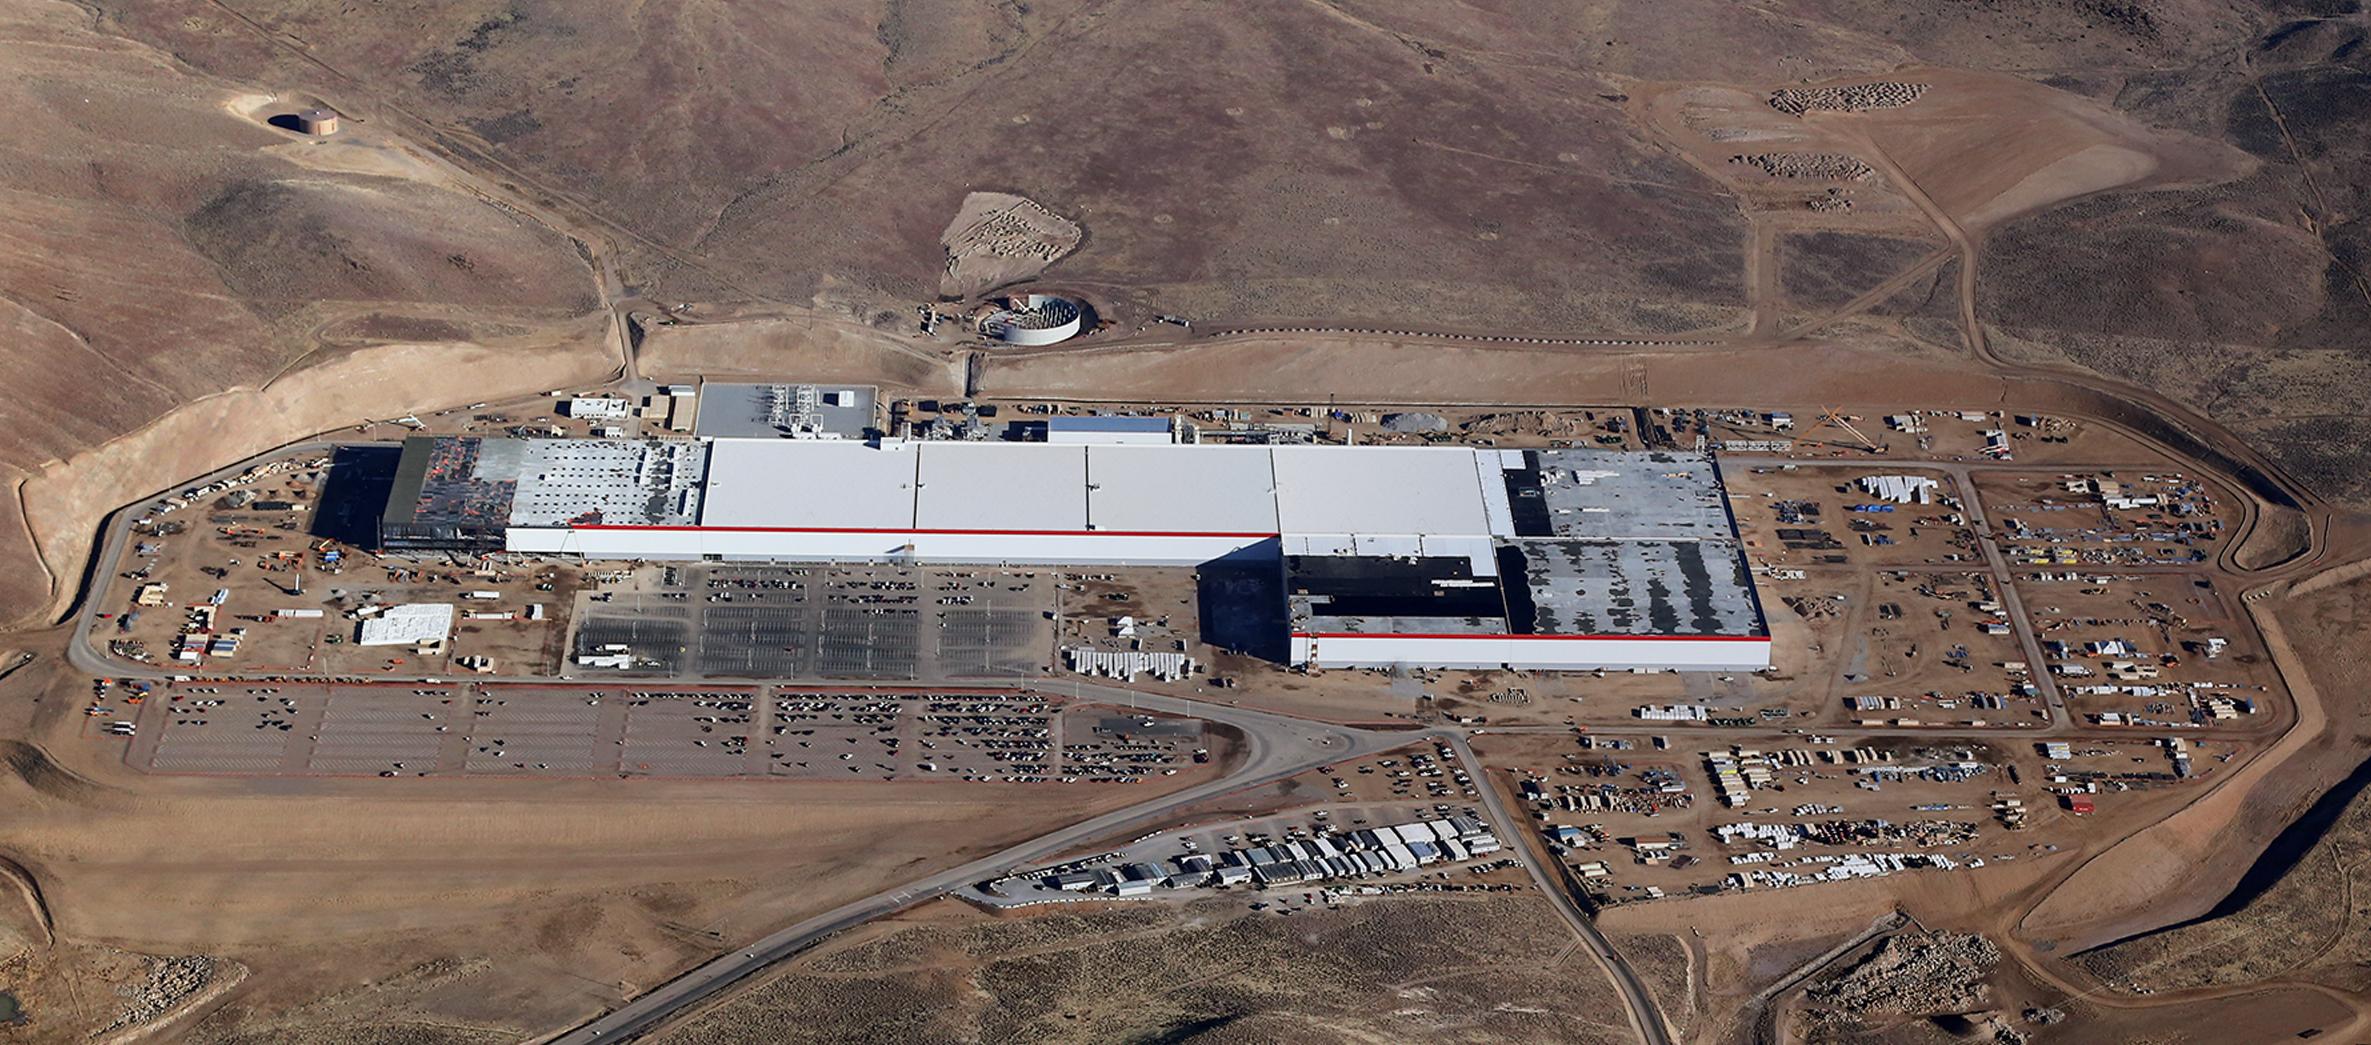 Tesla's Gigafactory 1 in Nevada